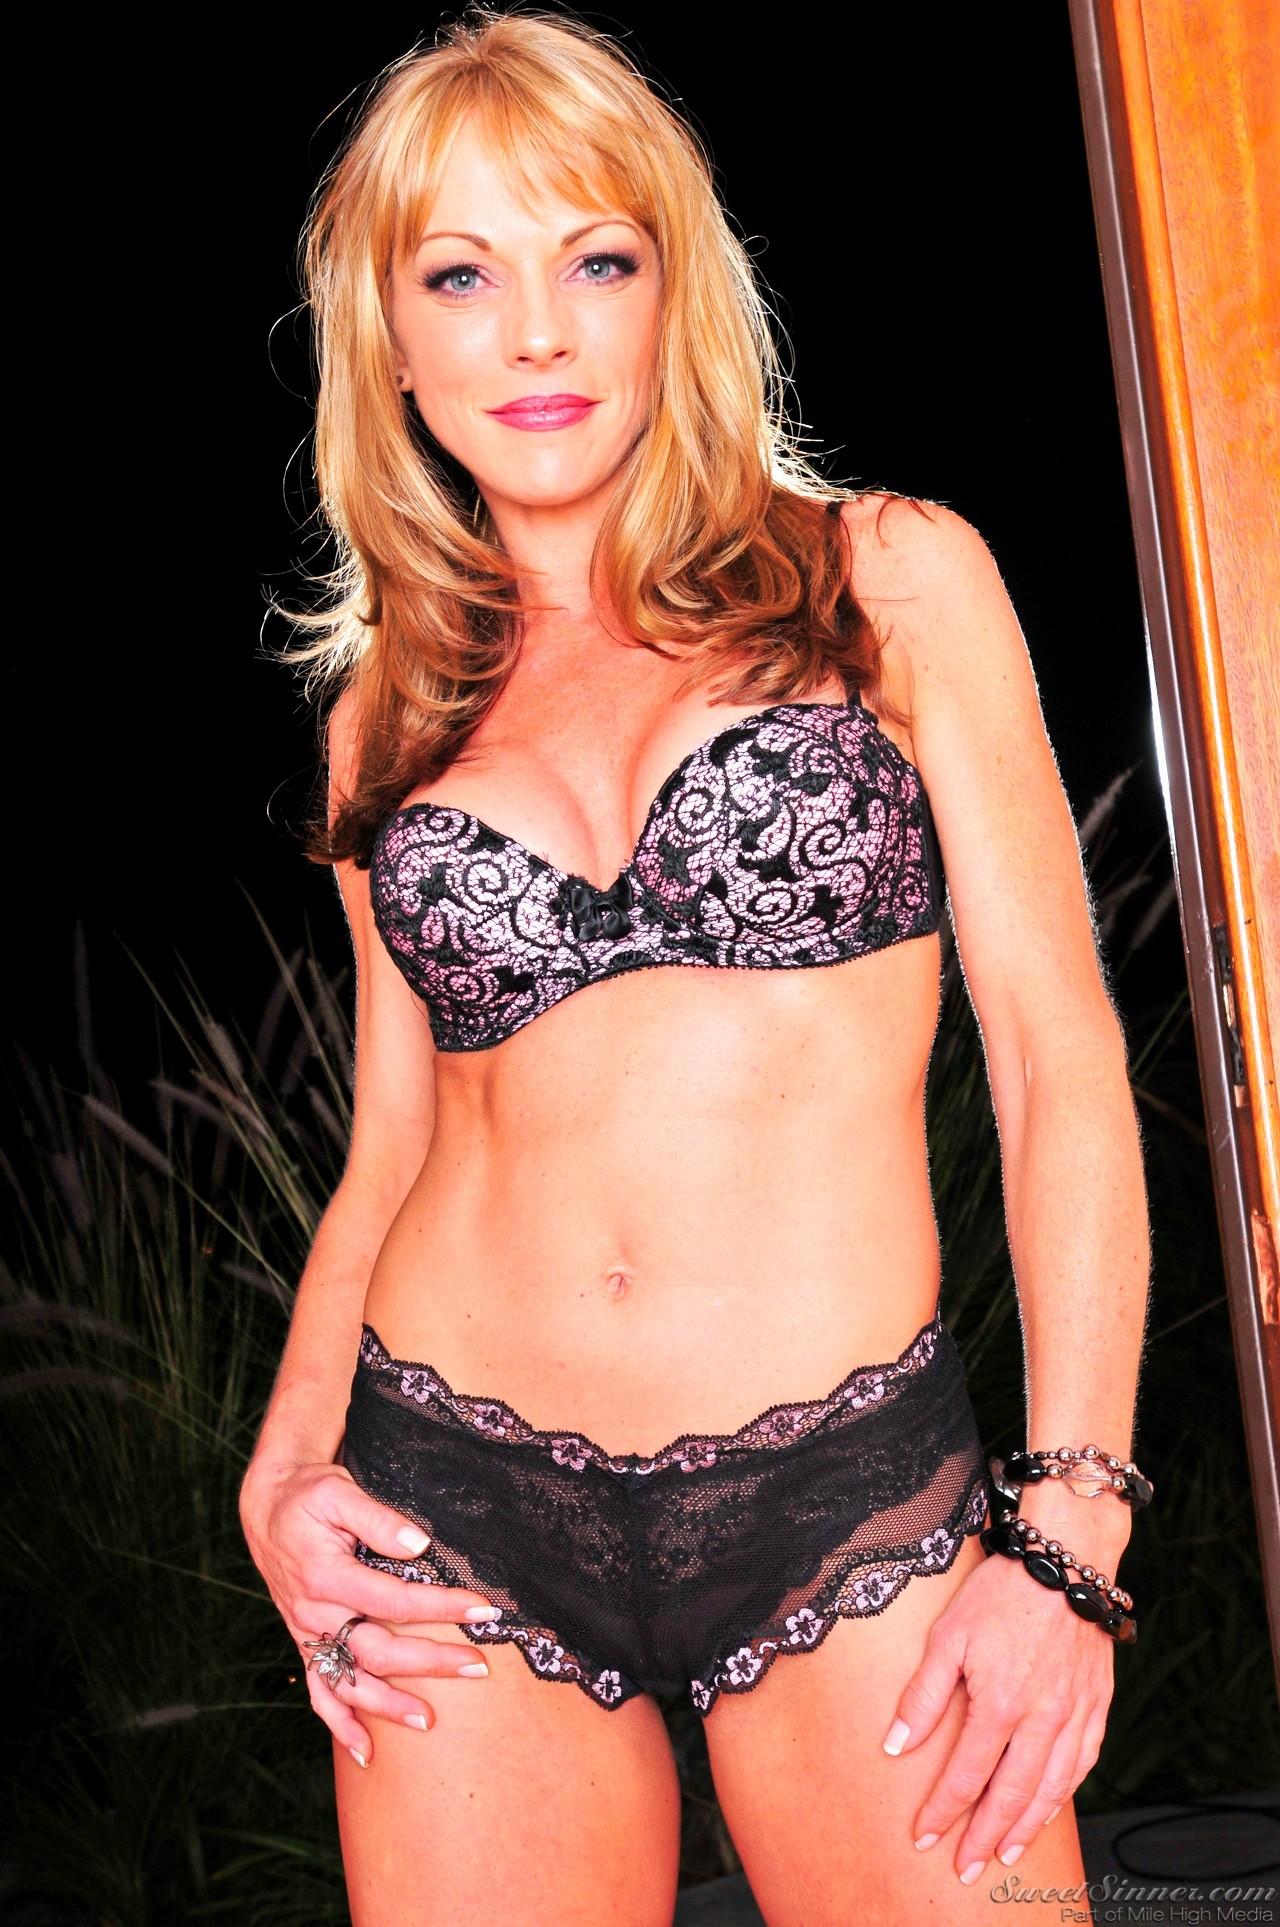 Shayla laveoux